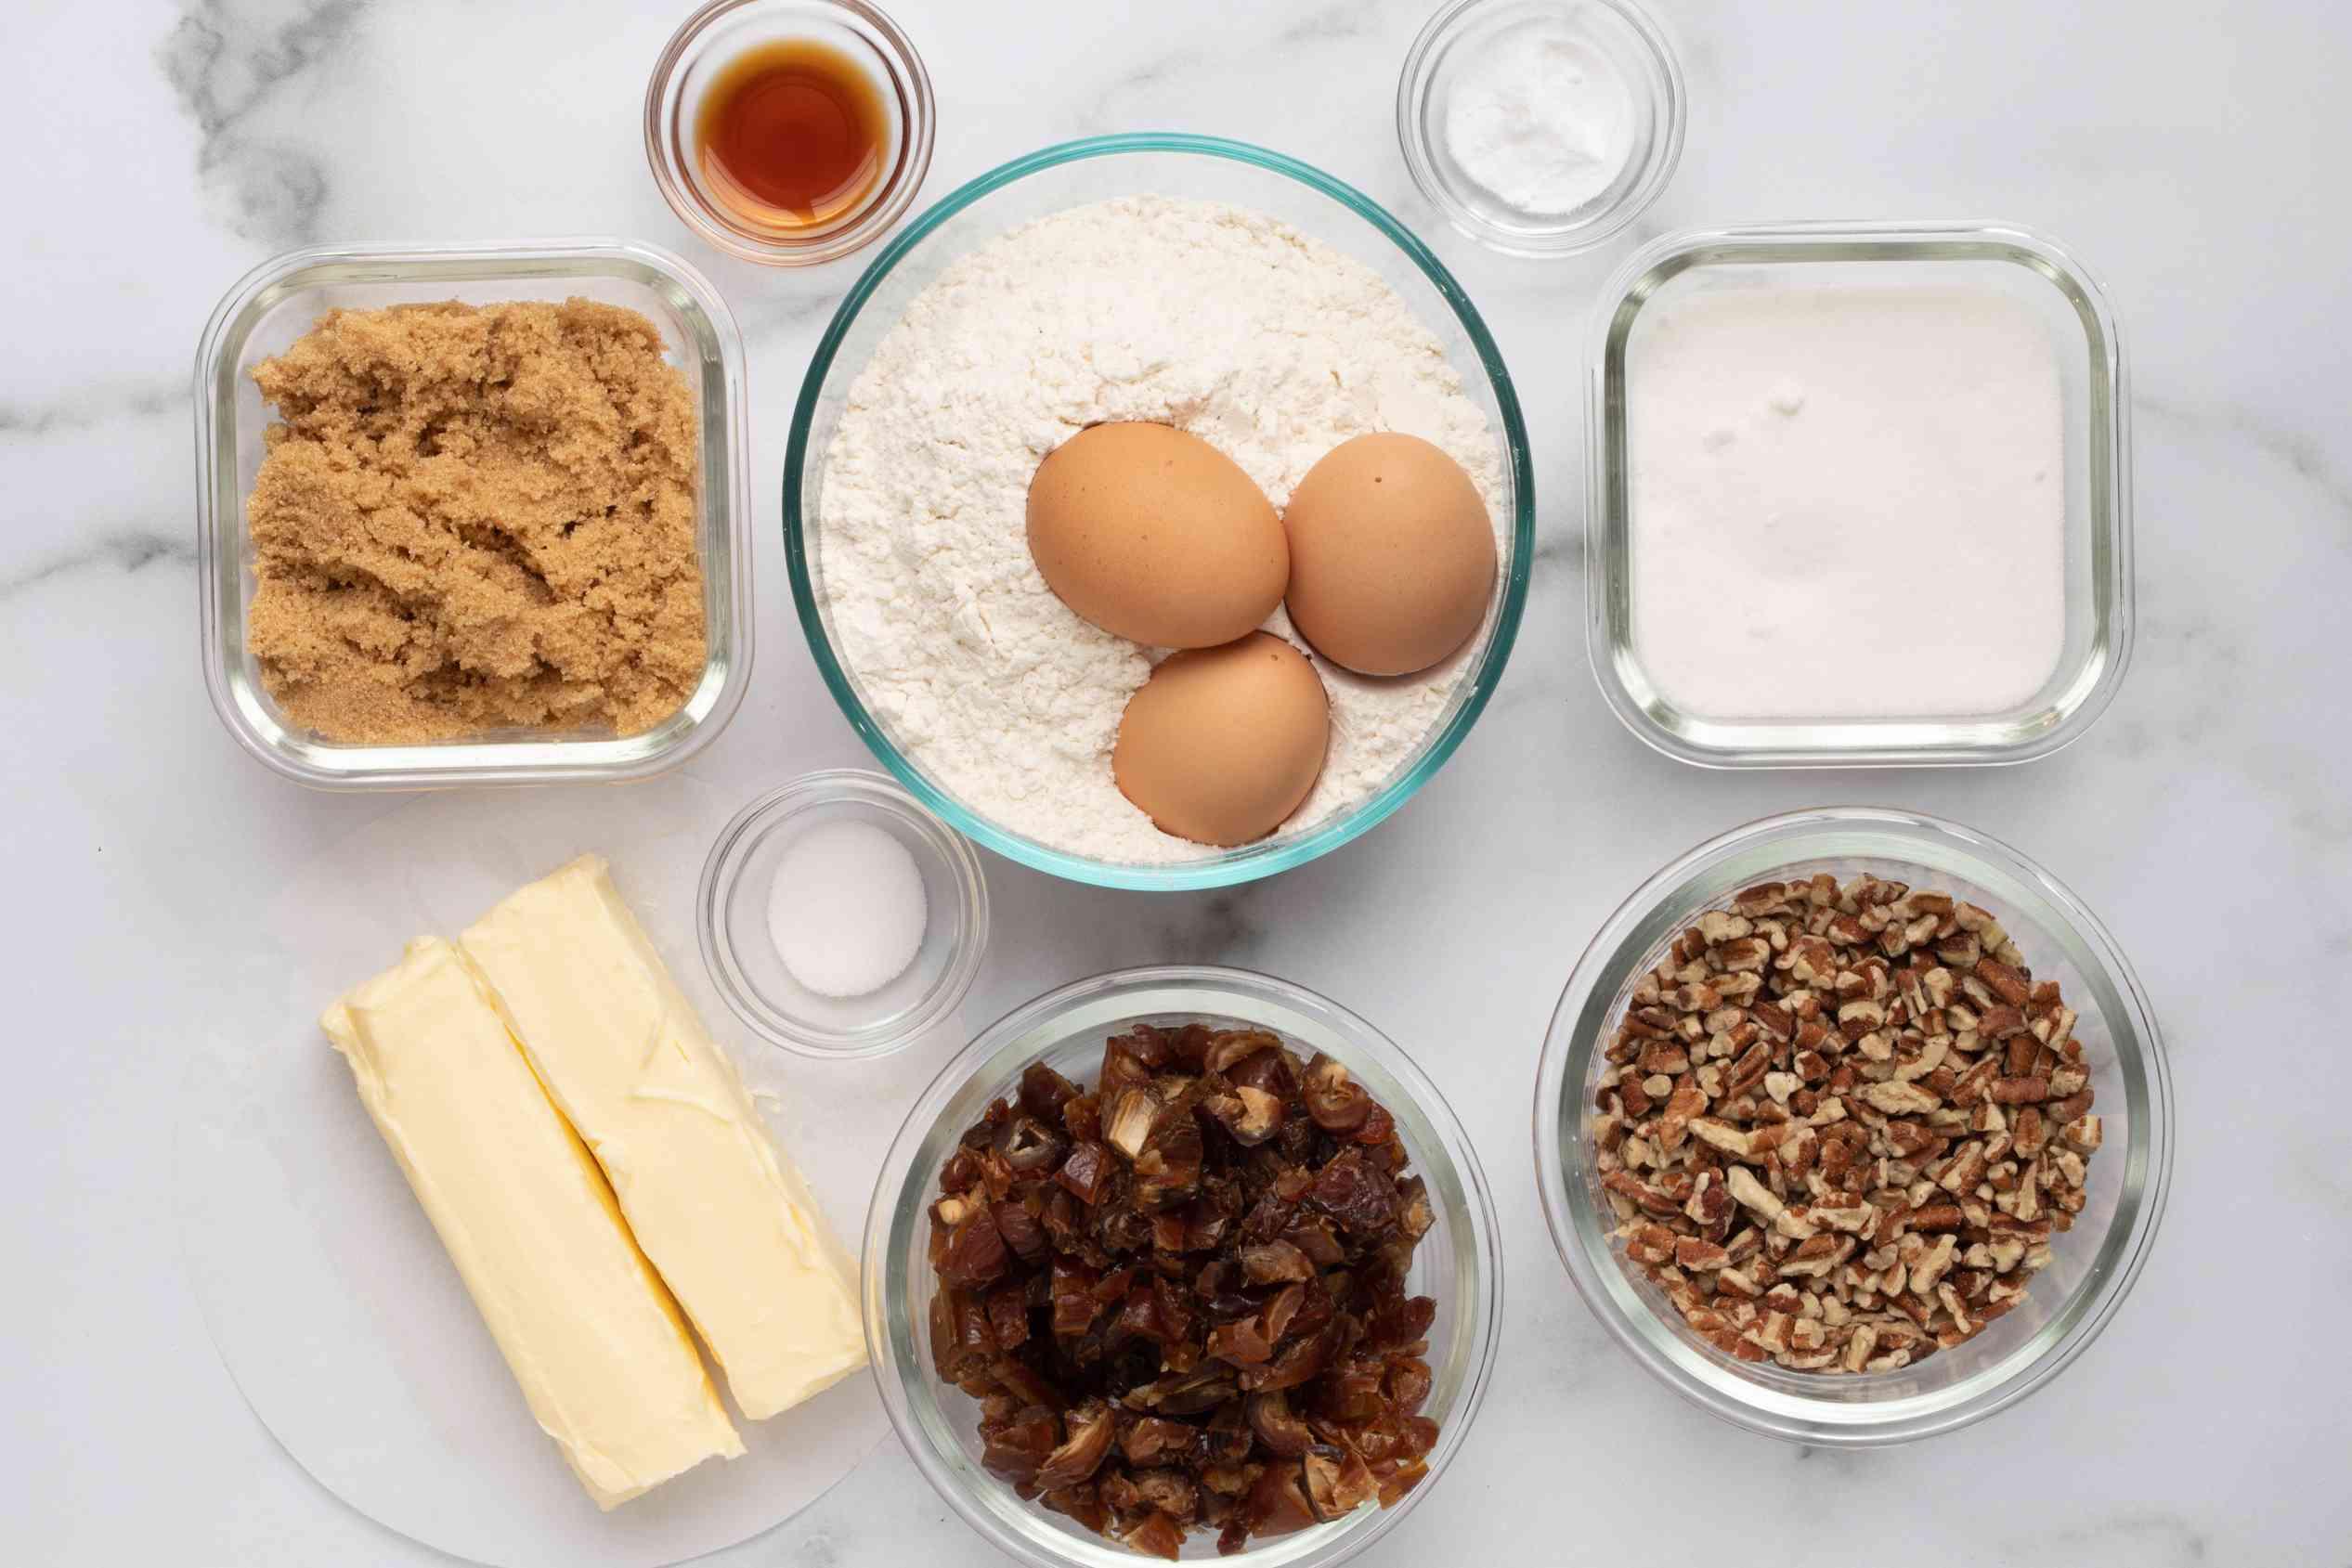 ingredients for date cookies